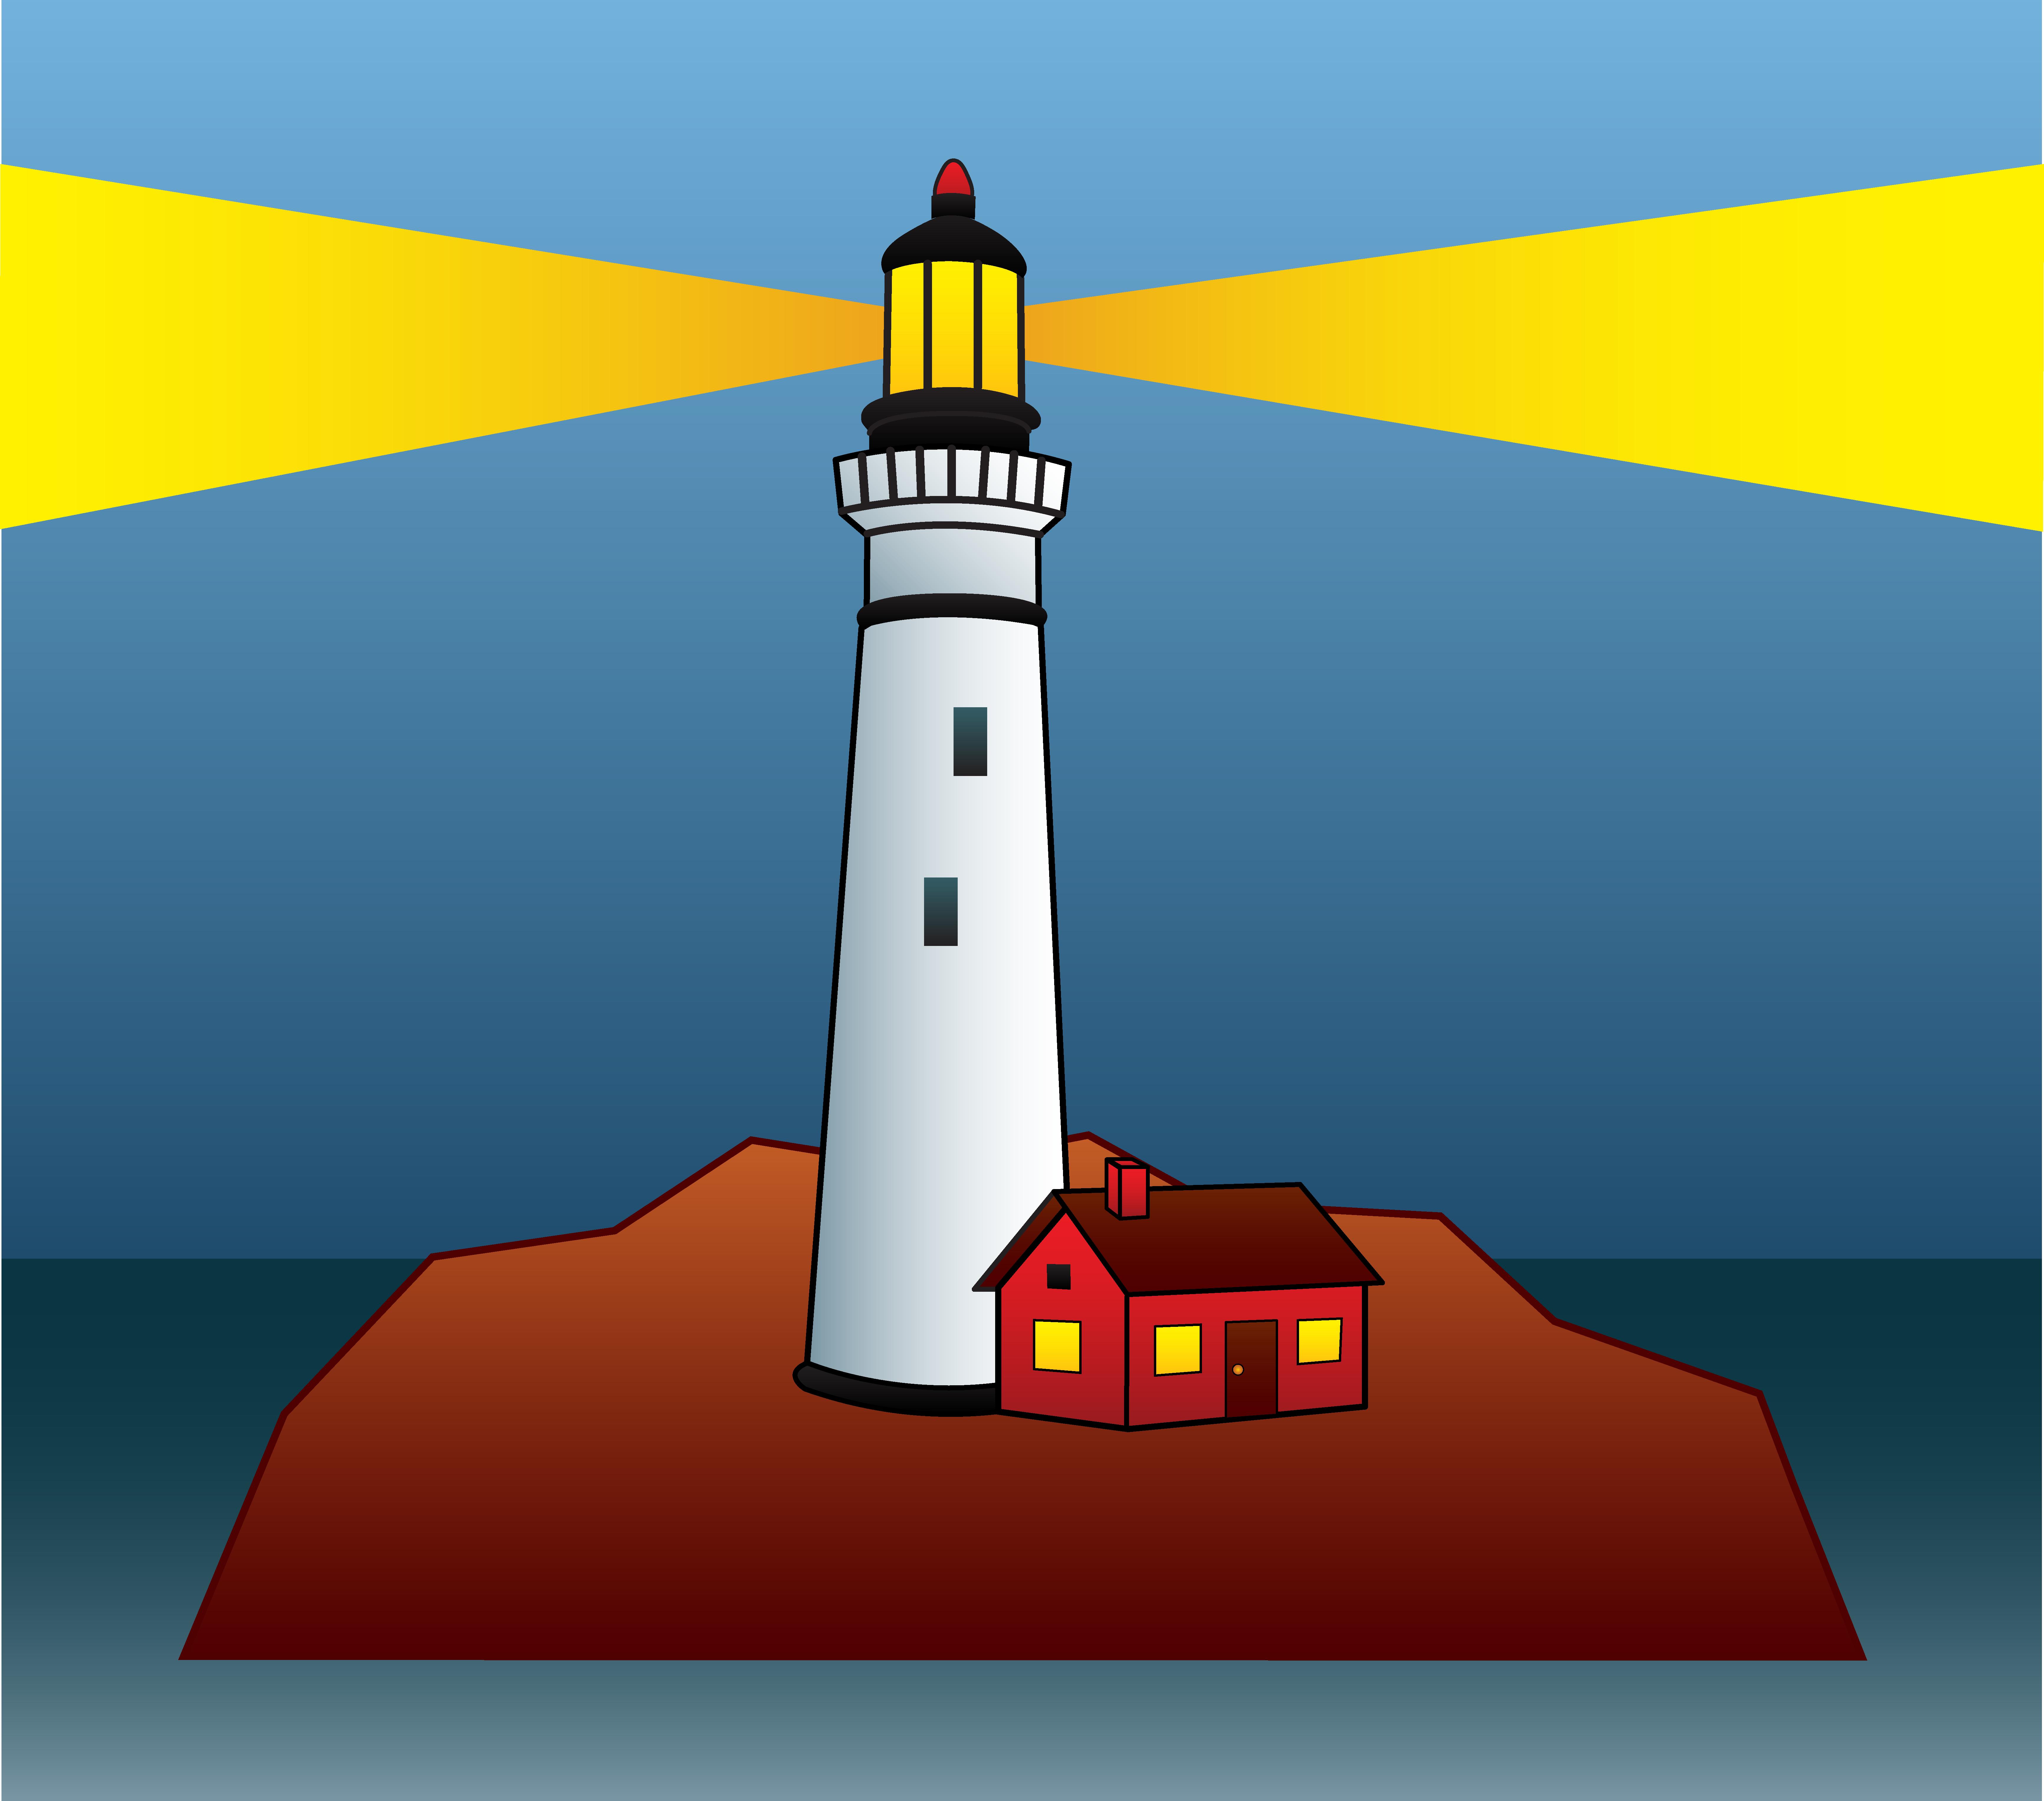 Lighthouse Shining Light At Night - Free-Lighthouse Shining Light At Night - Free Clip Art-11